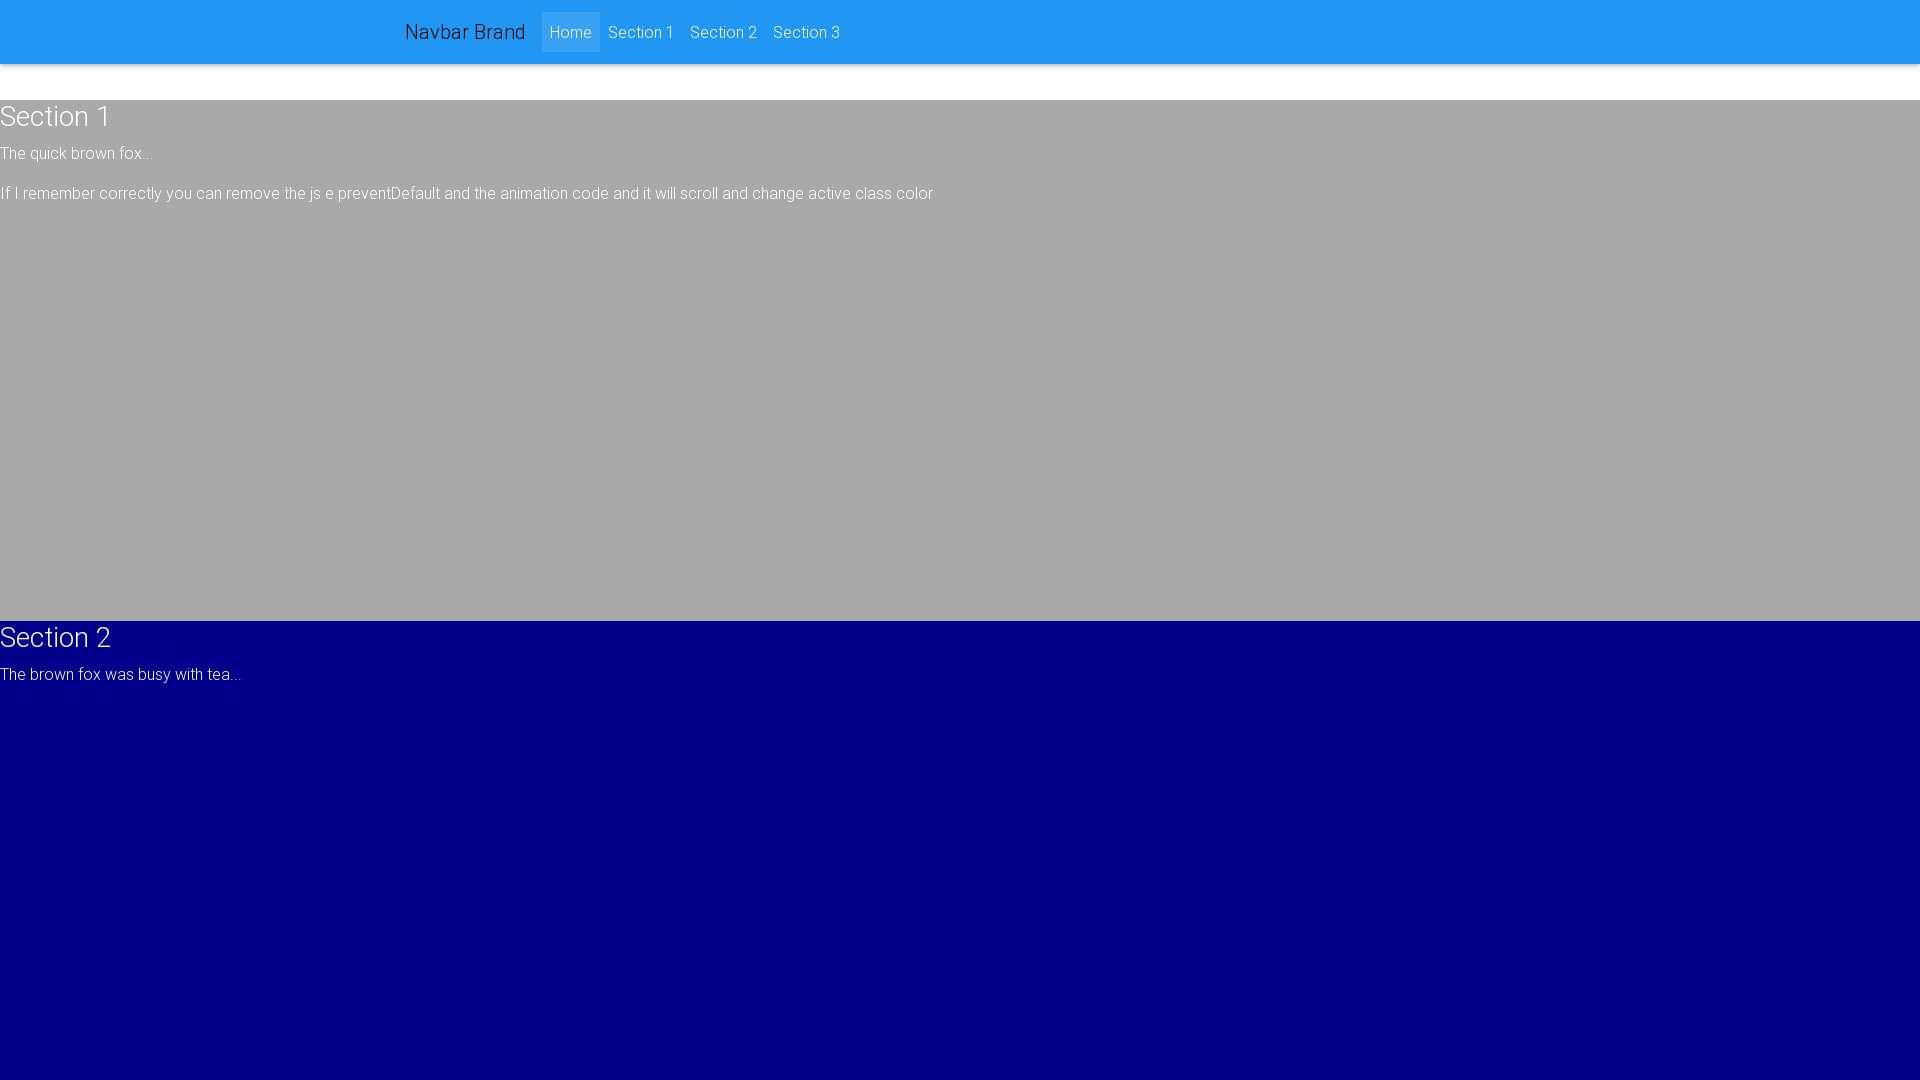 Highlight active class in nav-bar - Material Design for Bootstrap